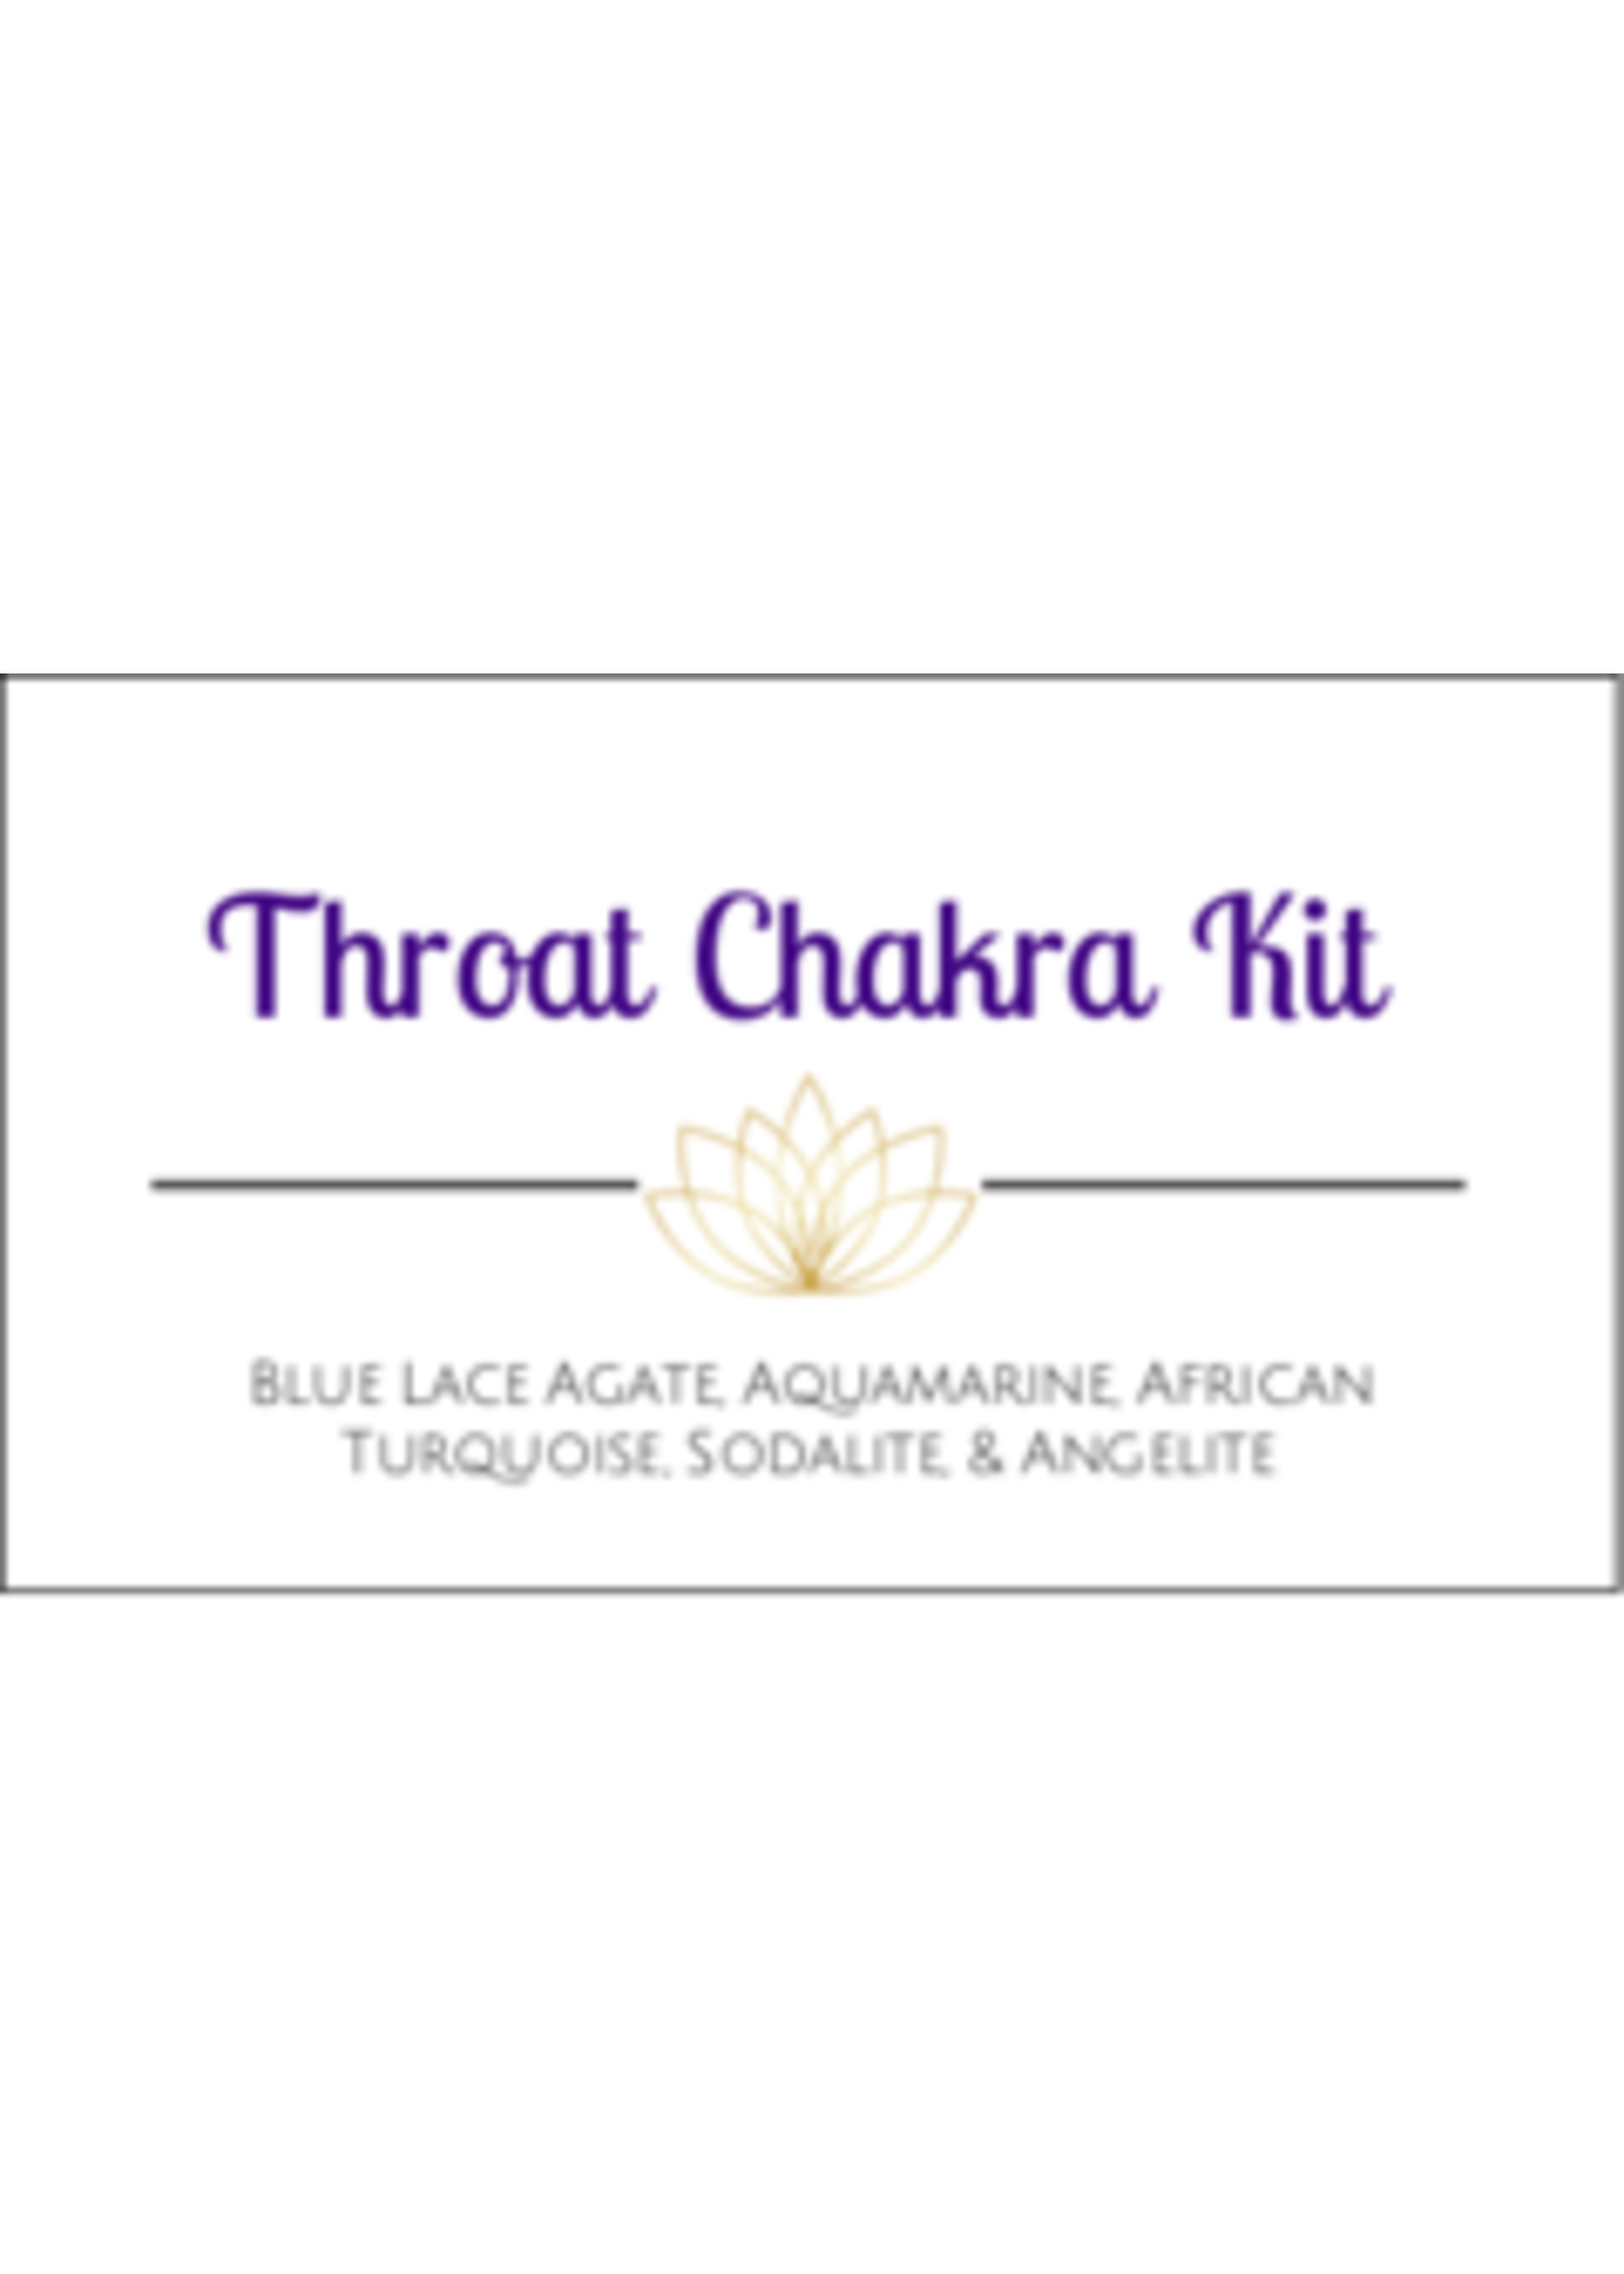 Throat Chakra Crystal Kit Cards - Box of 100